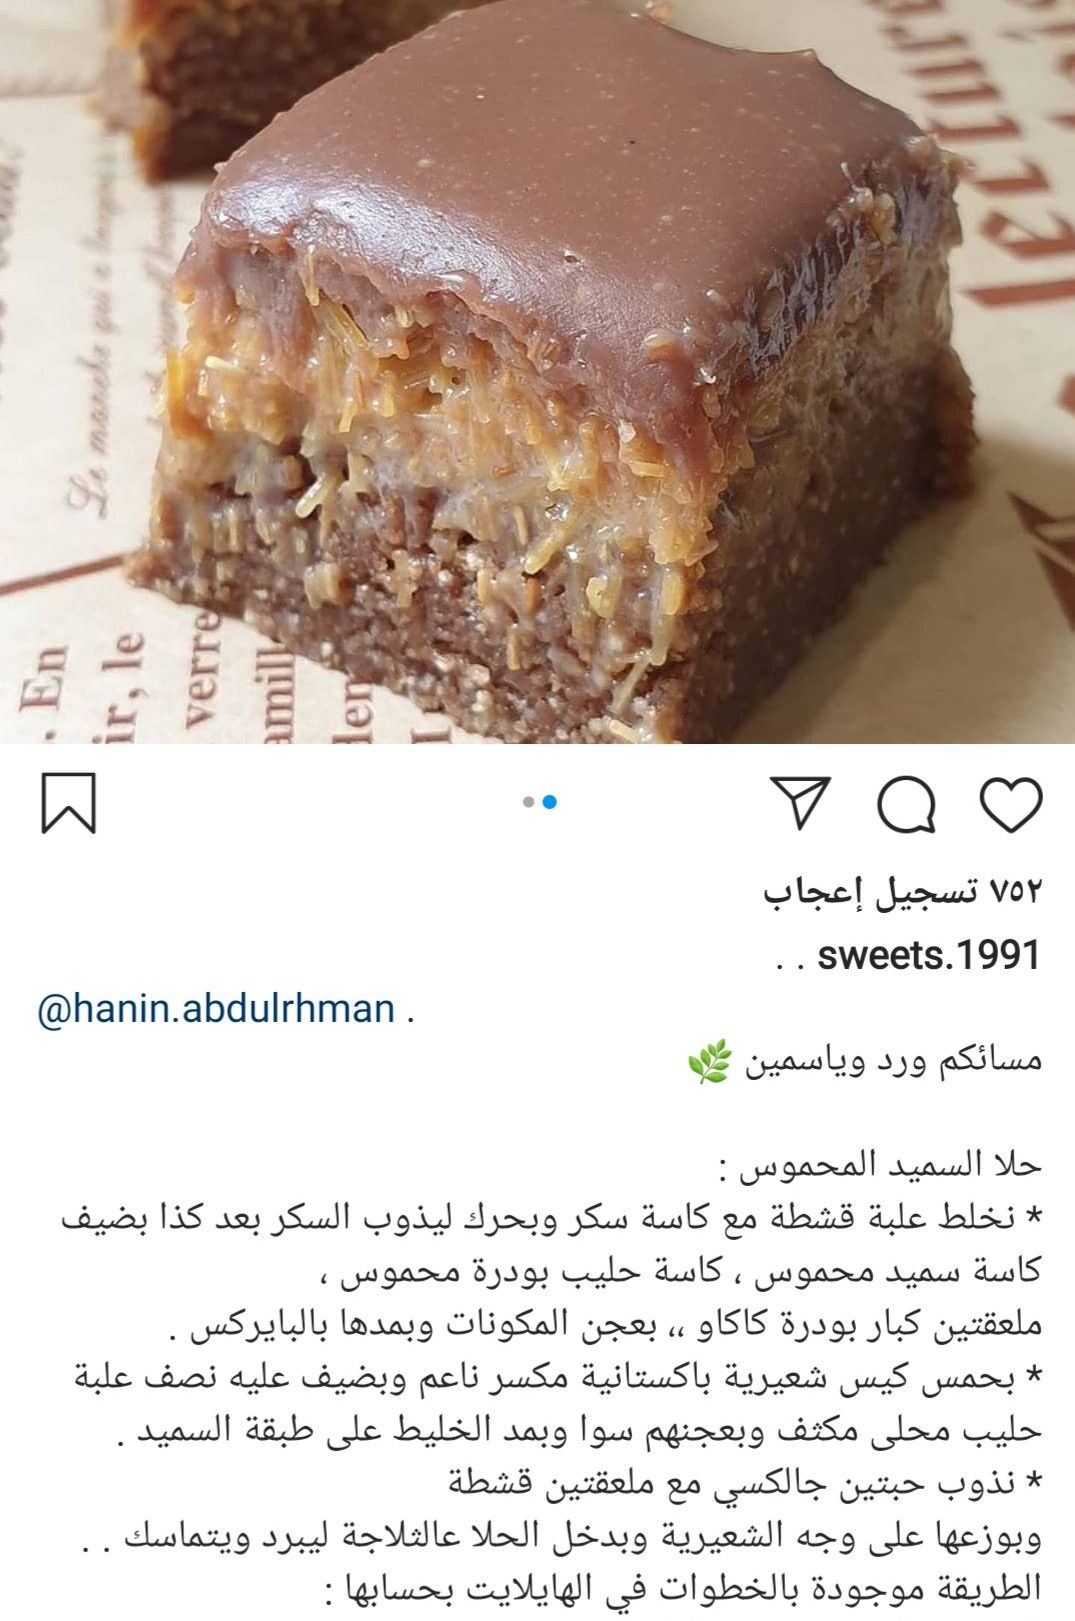 Pin By Haidy On حالي ومالح Food Banana Bread Desserts